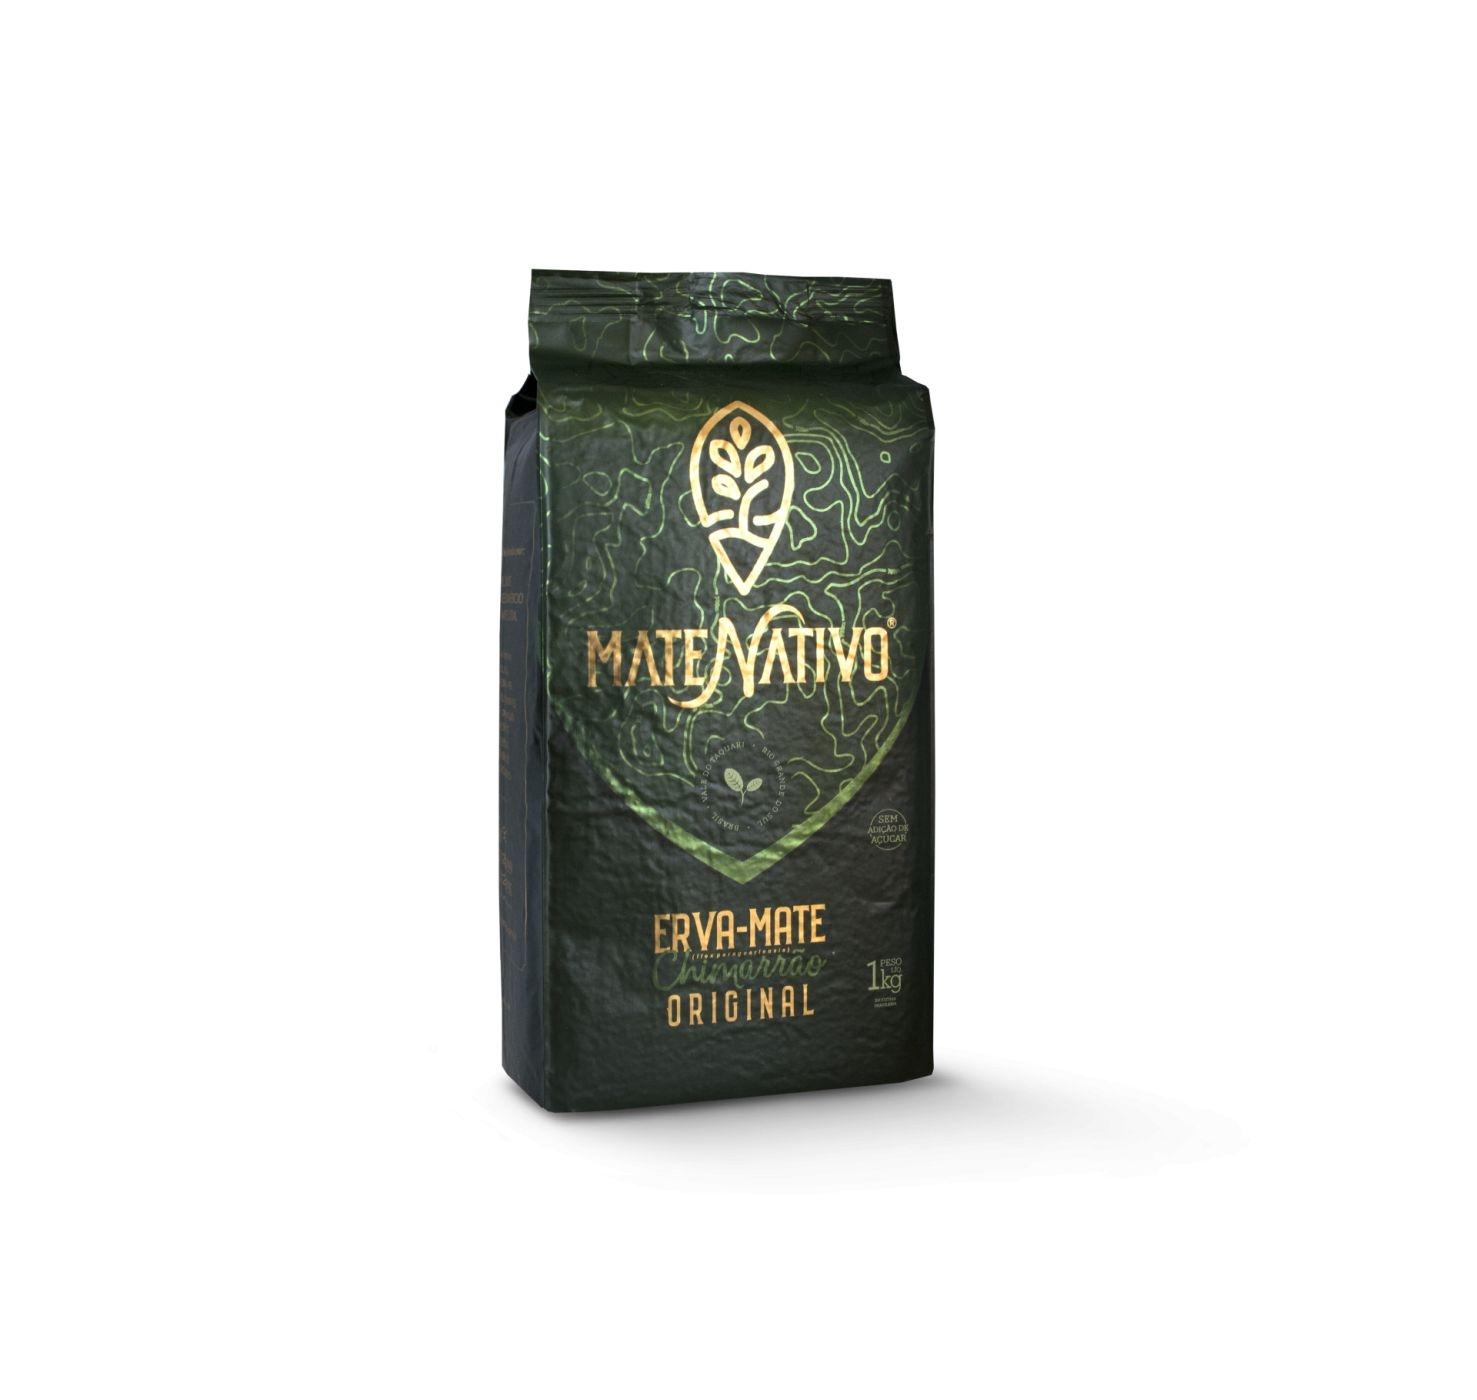 Original Mate Nativo Erva Mate